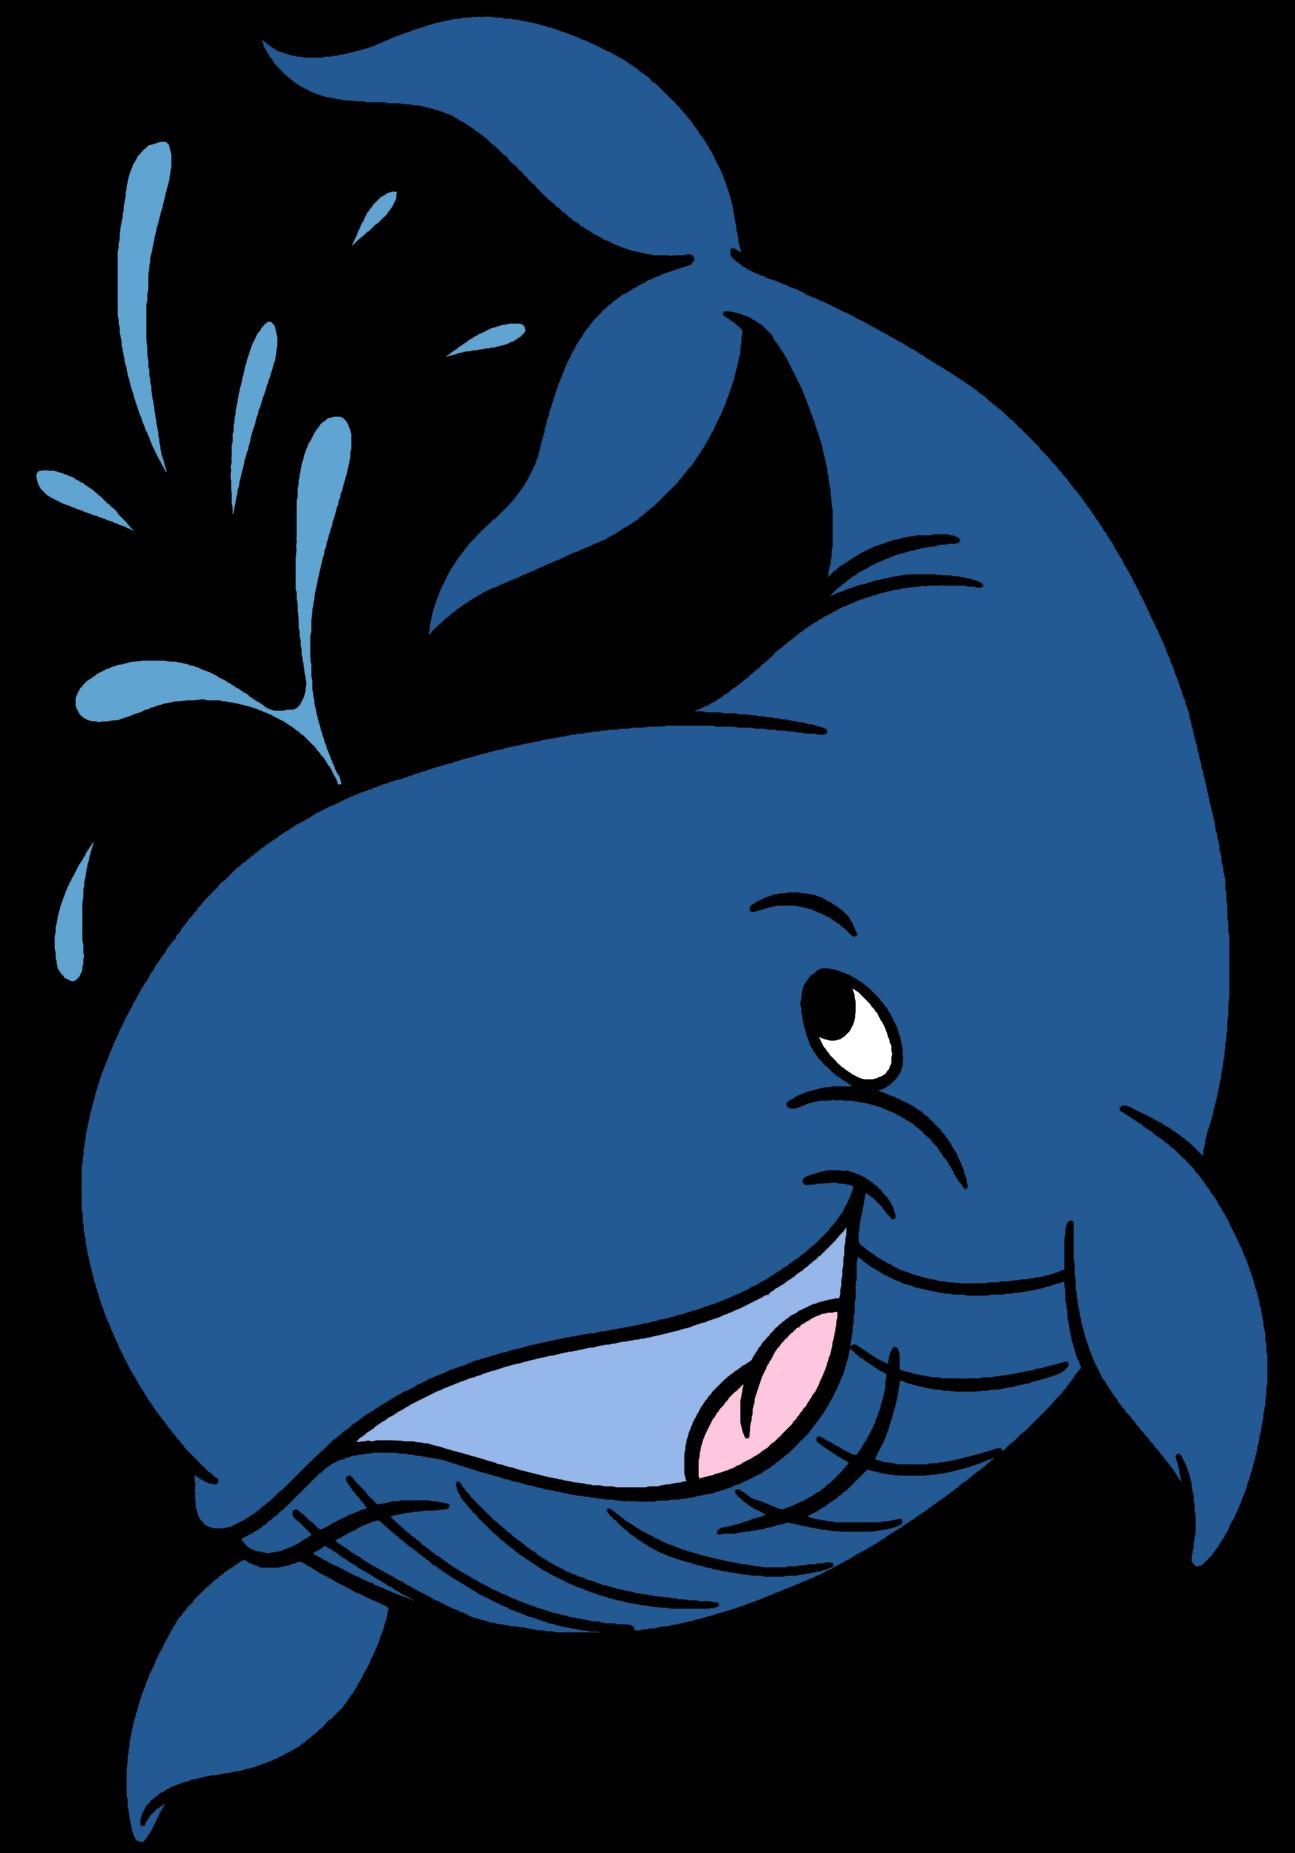 Whale Clipart Fishing Cartoons Pinterest Clip Art Whale.